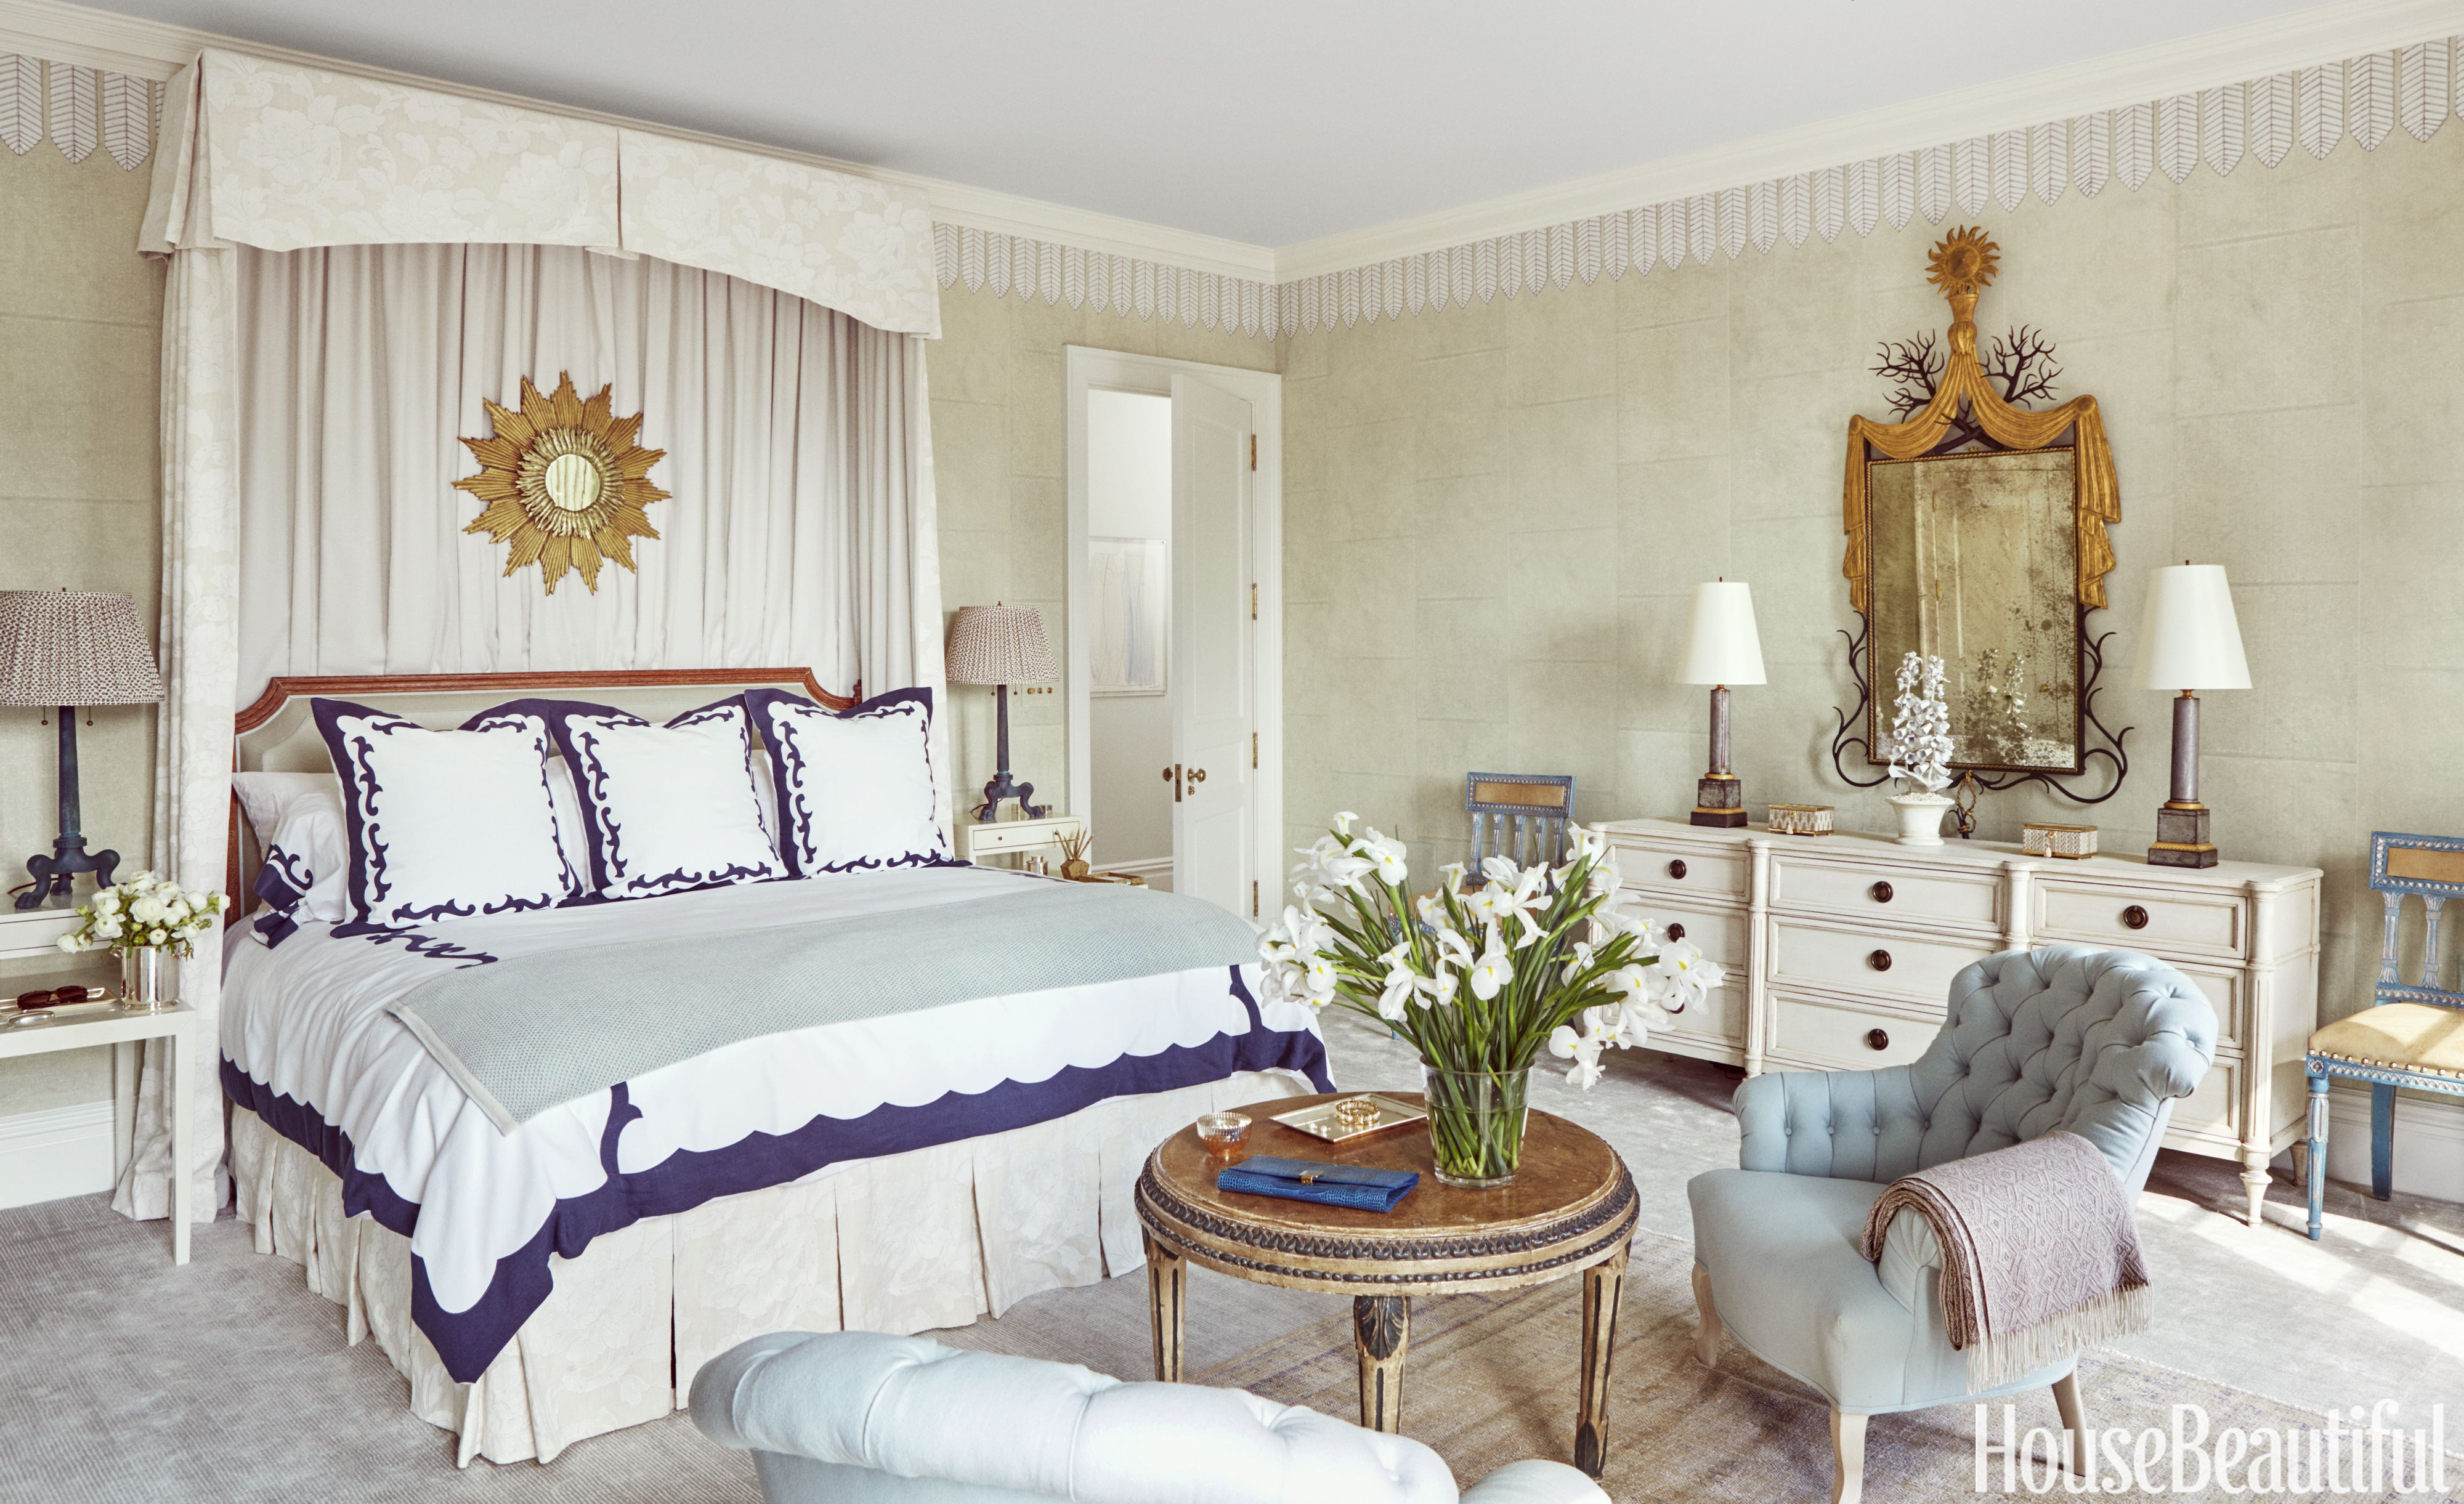 Room decoration 100 stylish bedroom decoration ideas - design tips for modern bedrooms NPWARHH